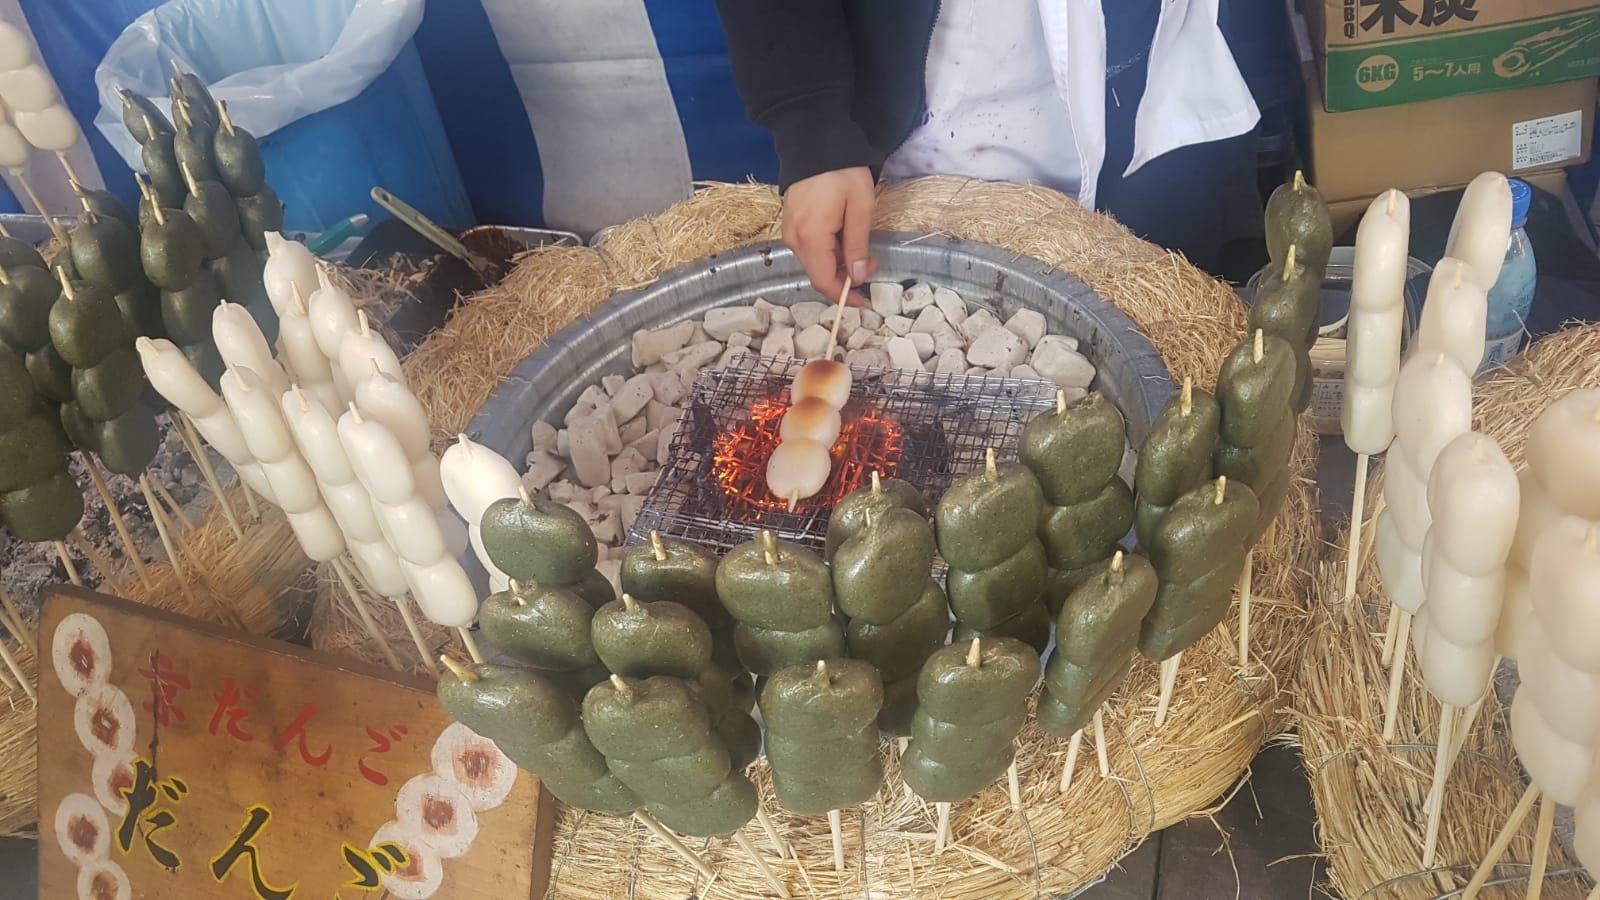 Kyoto Food 1000 Tore